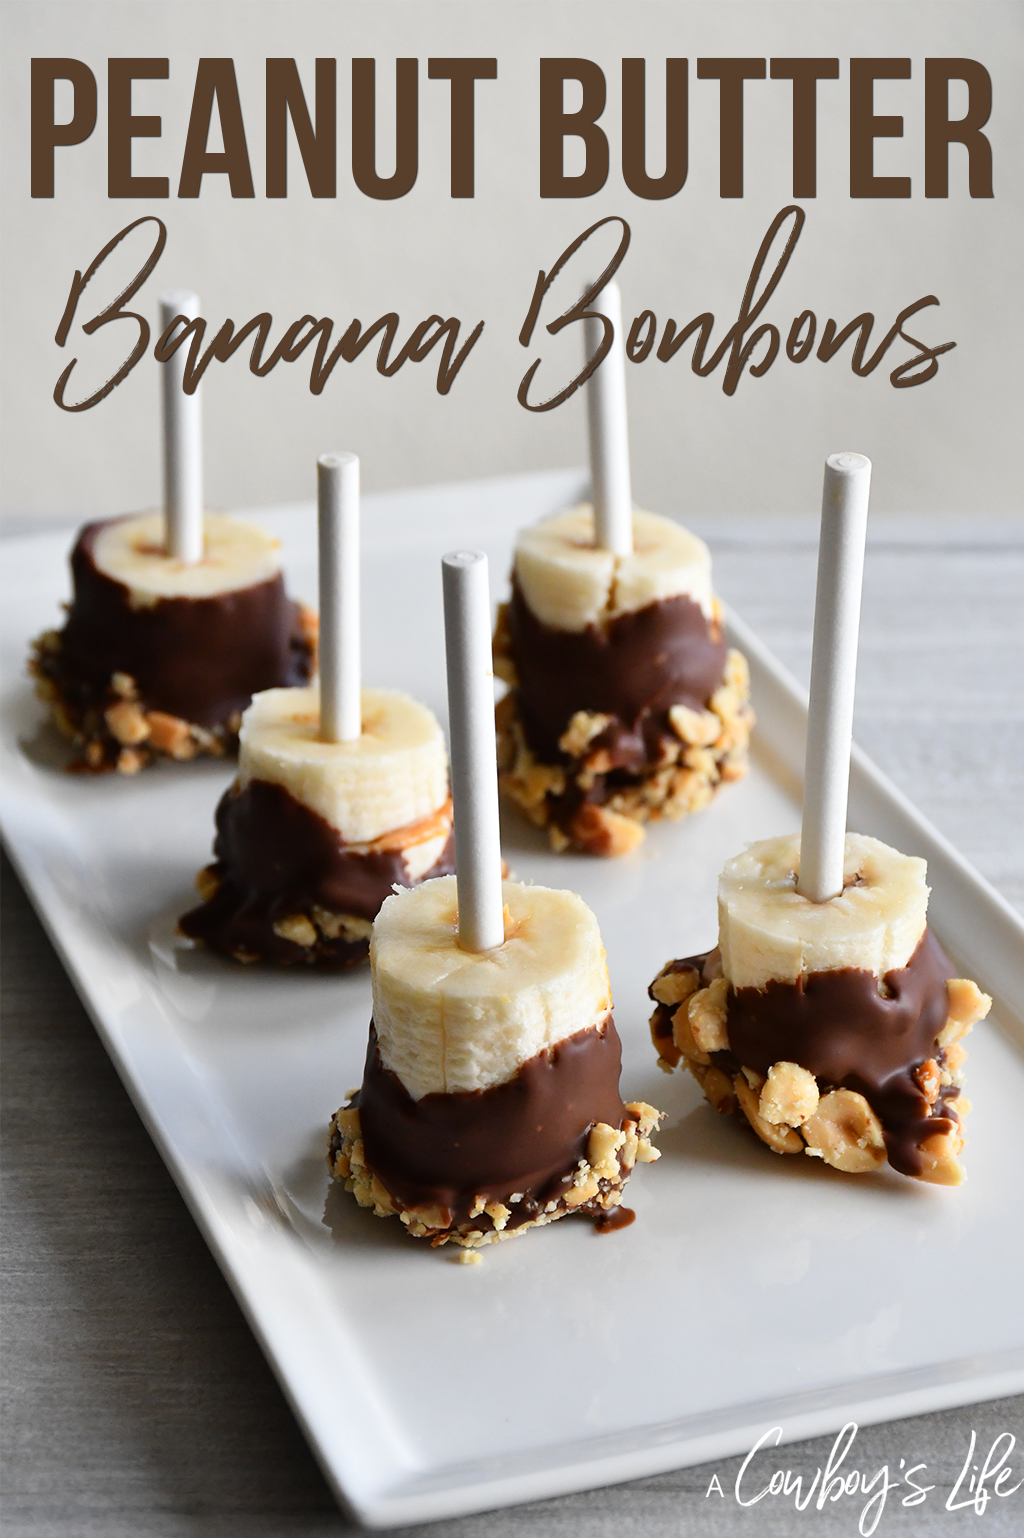 How to make Peanut Butter Banana Bonbons